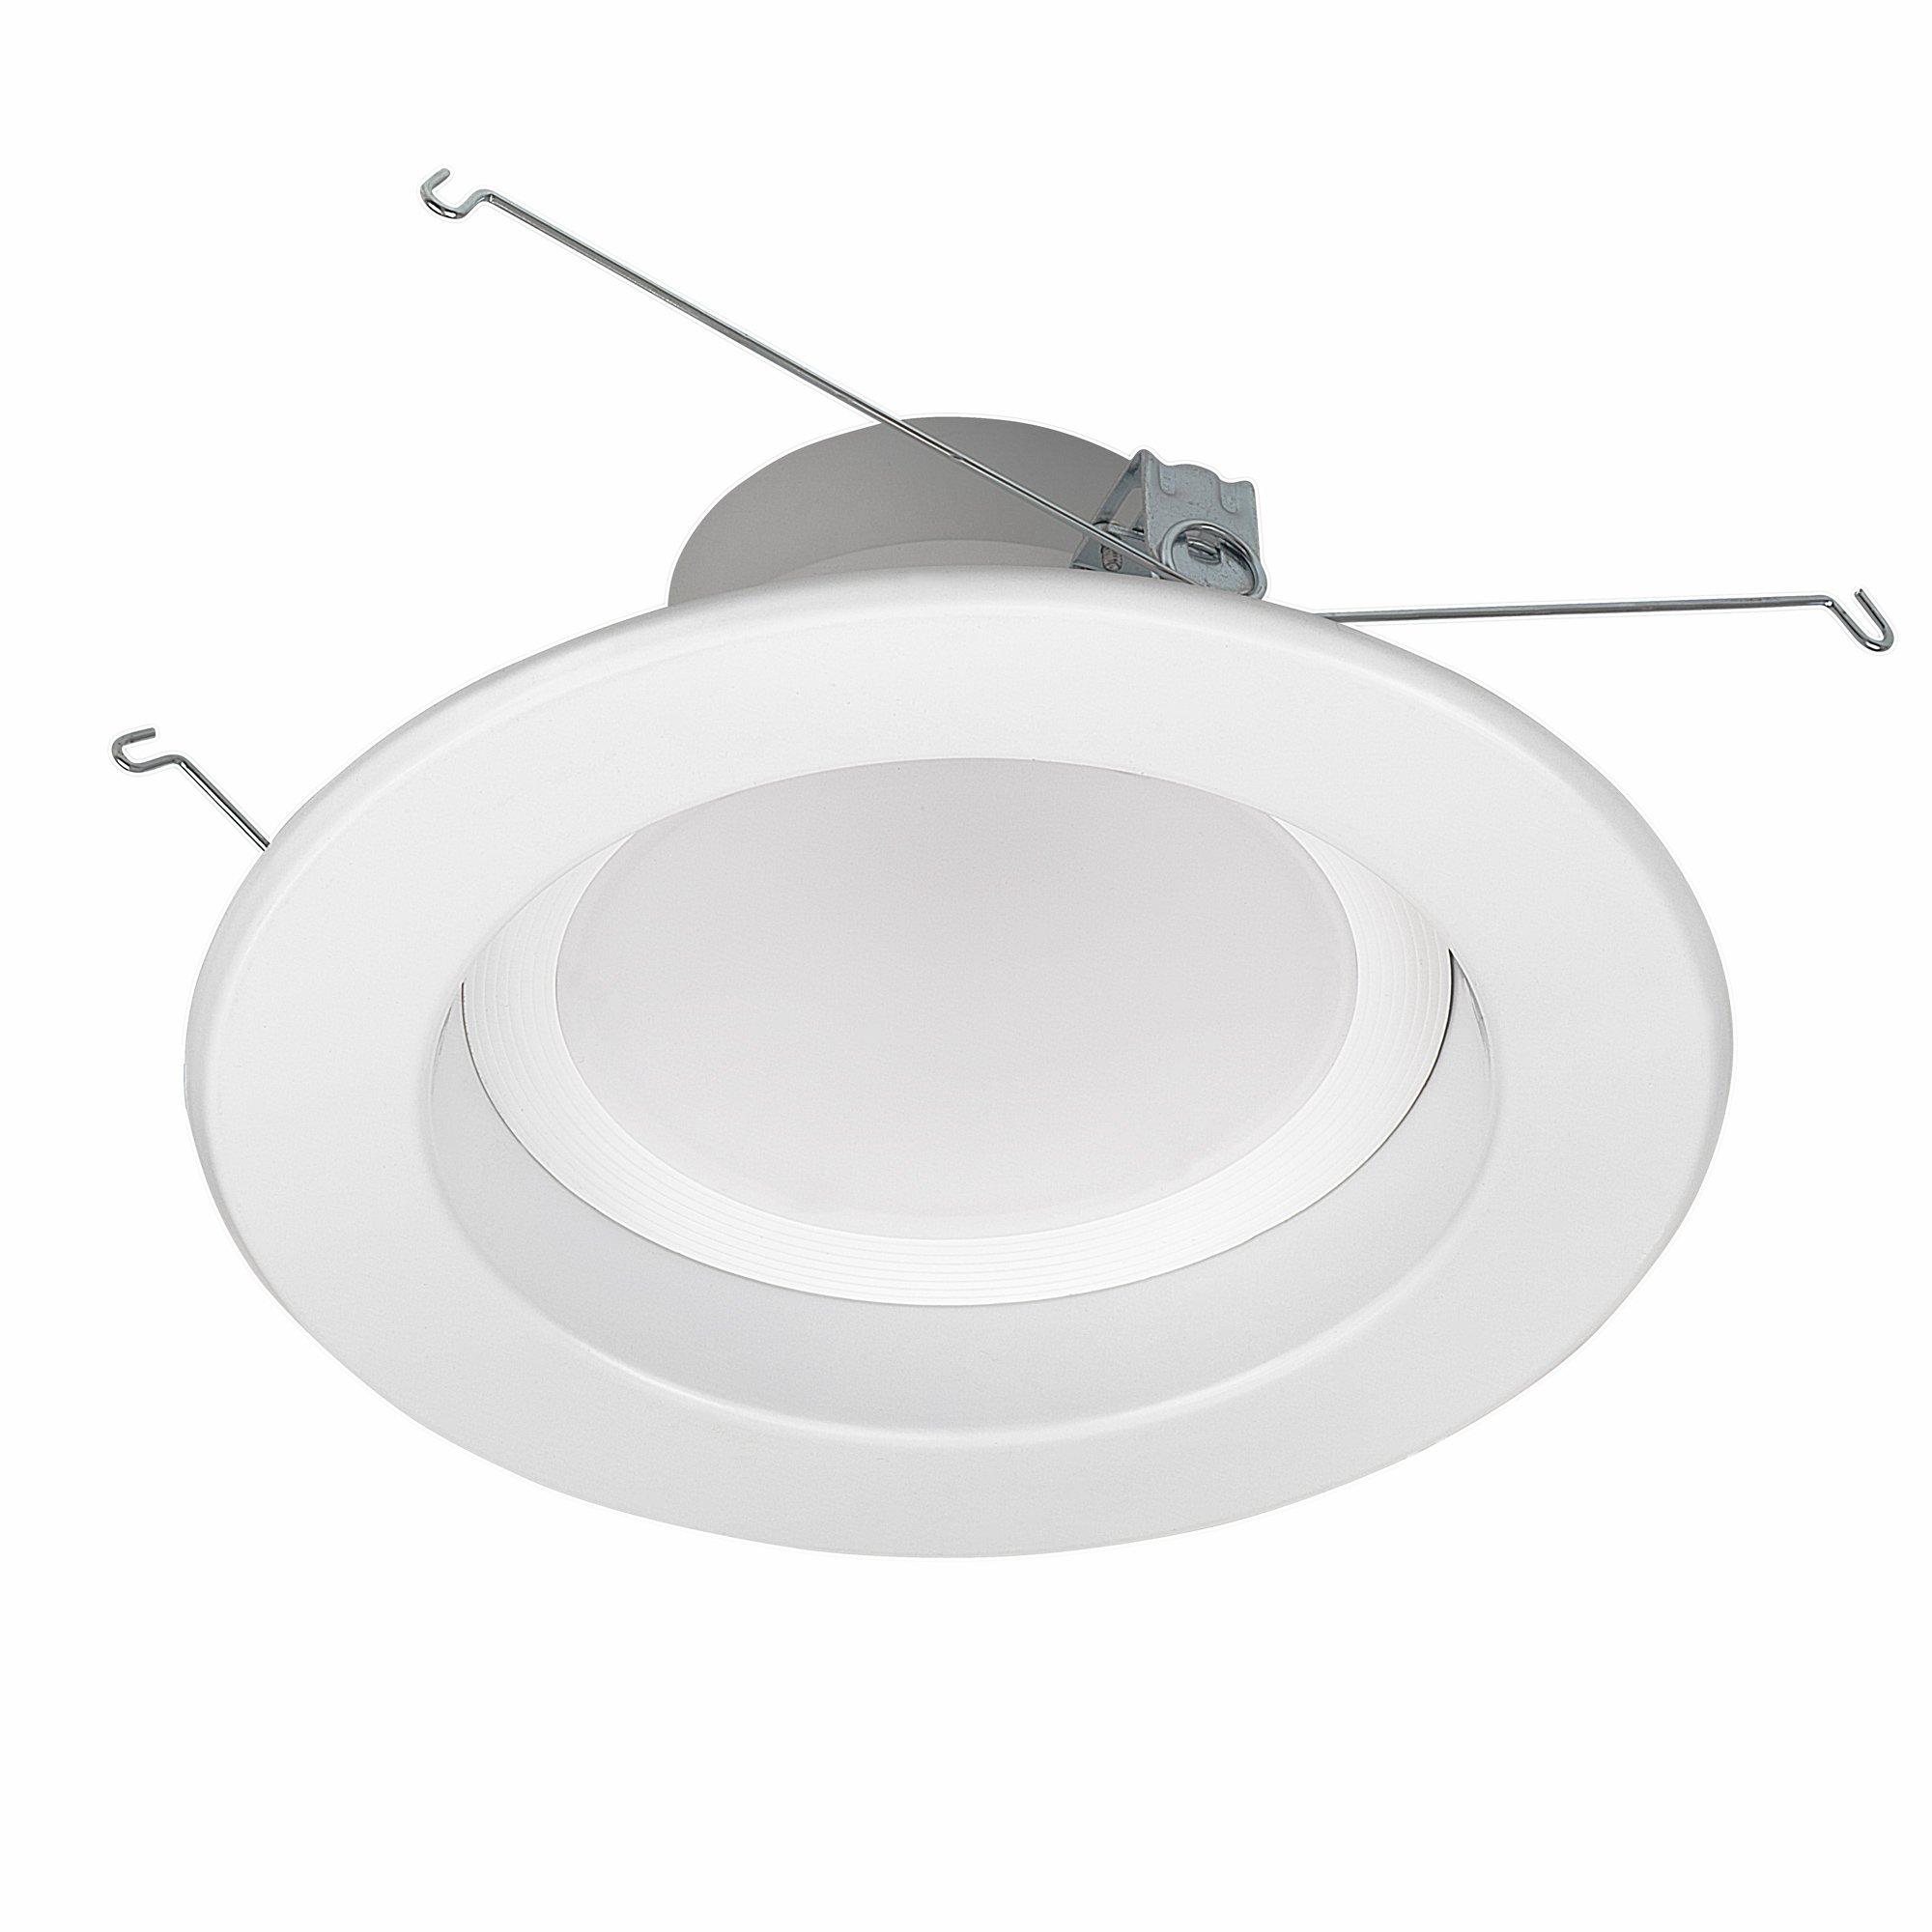 LB13115 5/6 Inch LED Downlight Retrofit Recessed Lighting